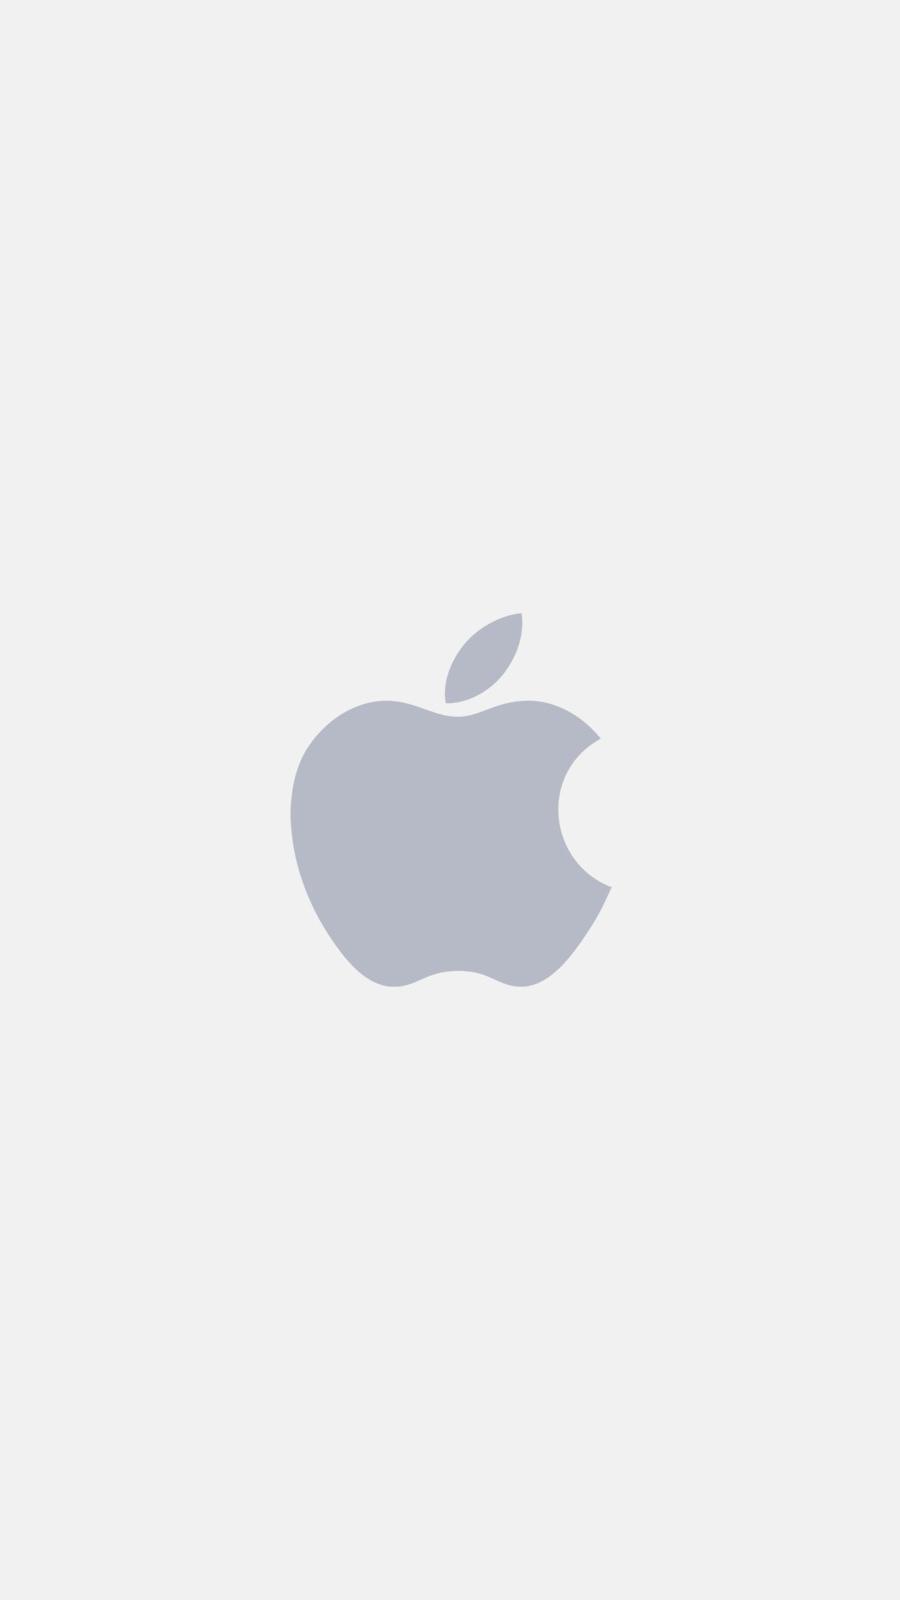 Apple minimal logo white iPhone Wallpaper iphoneswallpapers com